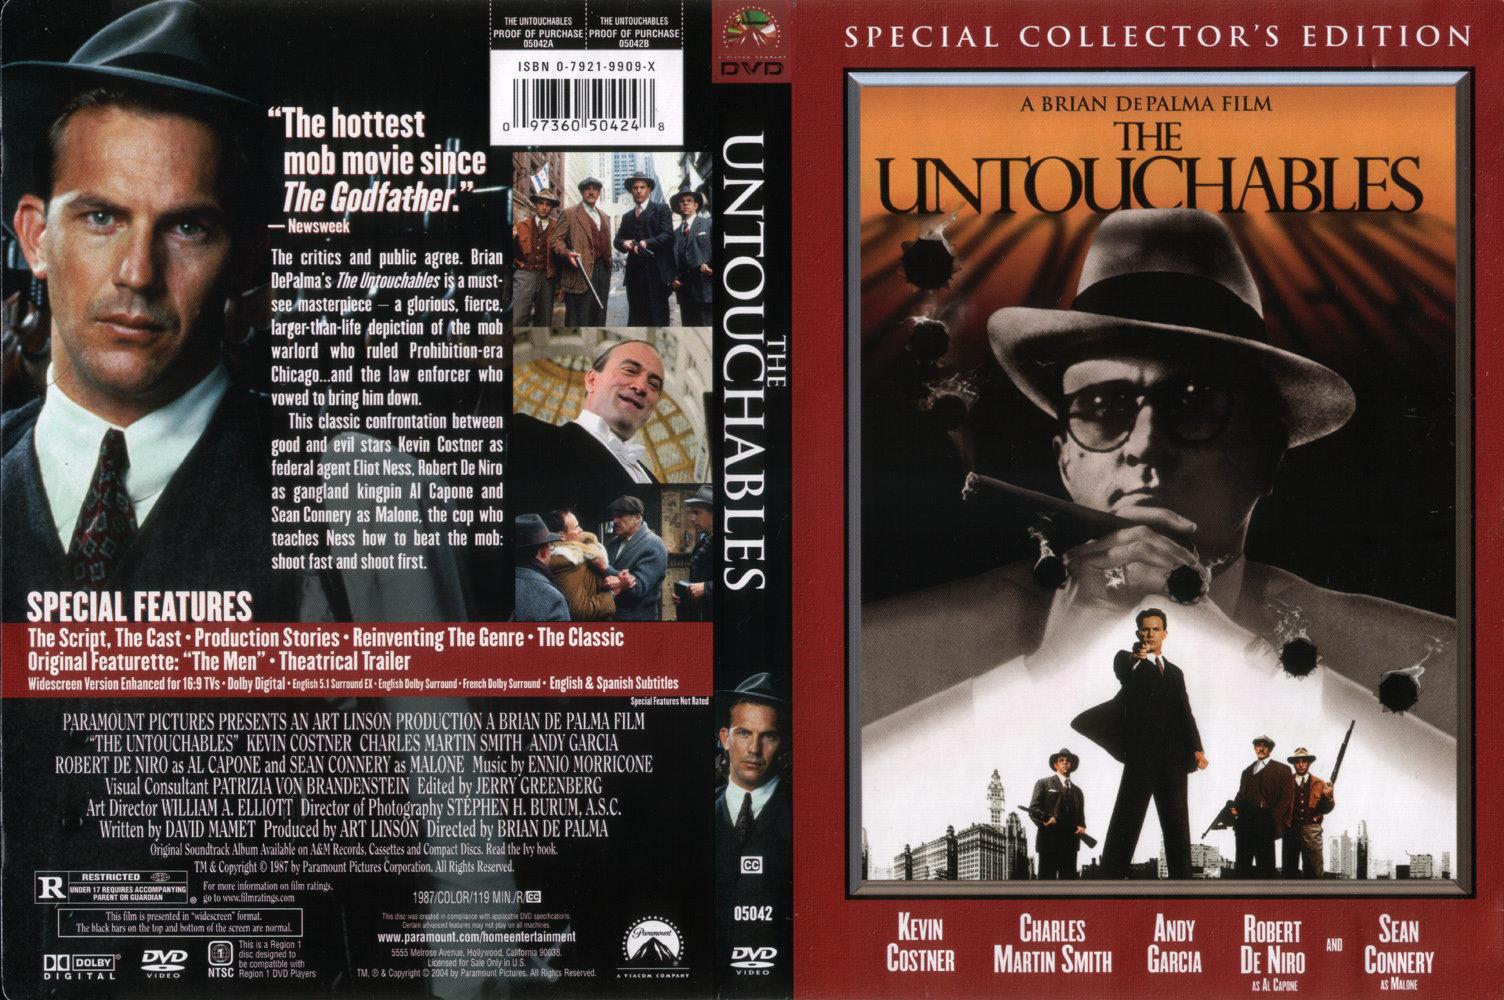 http://1.bp.blogspot.com/-RlB8C7eVYuE/Tf31iK_4-MI/AAAAAAAAAxk/yj-EXWfA_Zc/s1600/The_Untouchables_Collectors_Edition-%5Bcdcovers_cc%5D-front.jpg